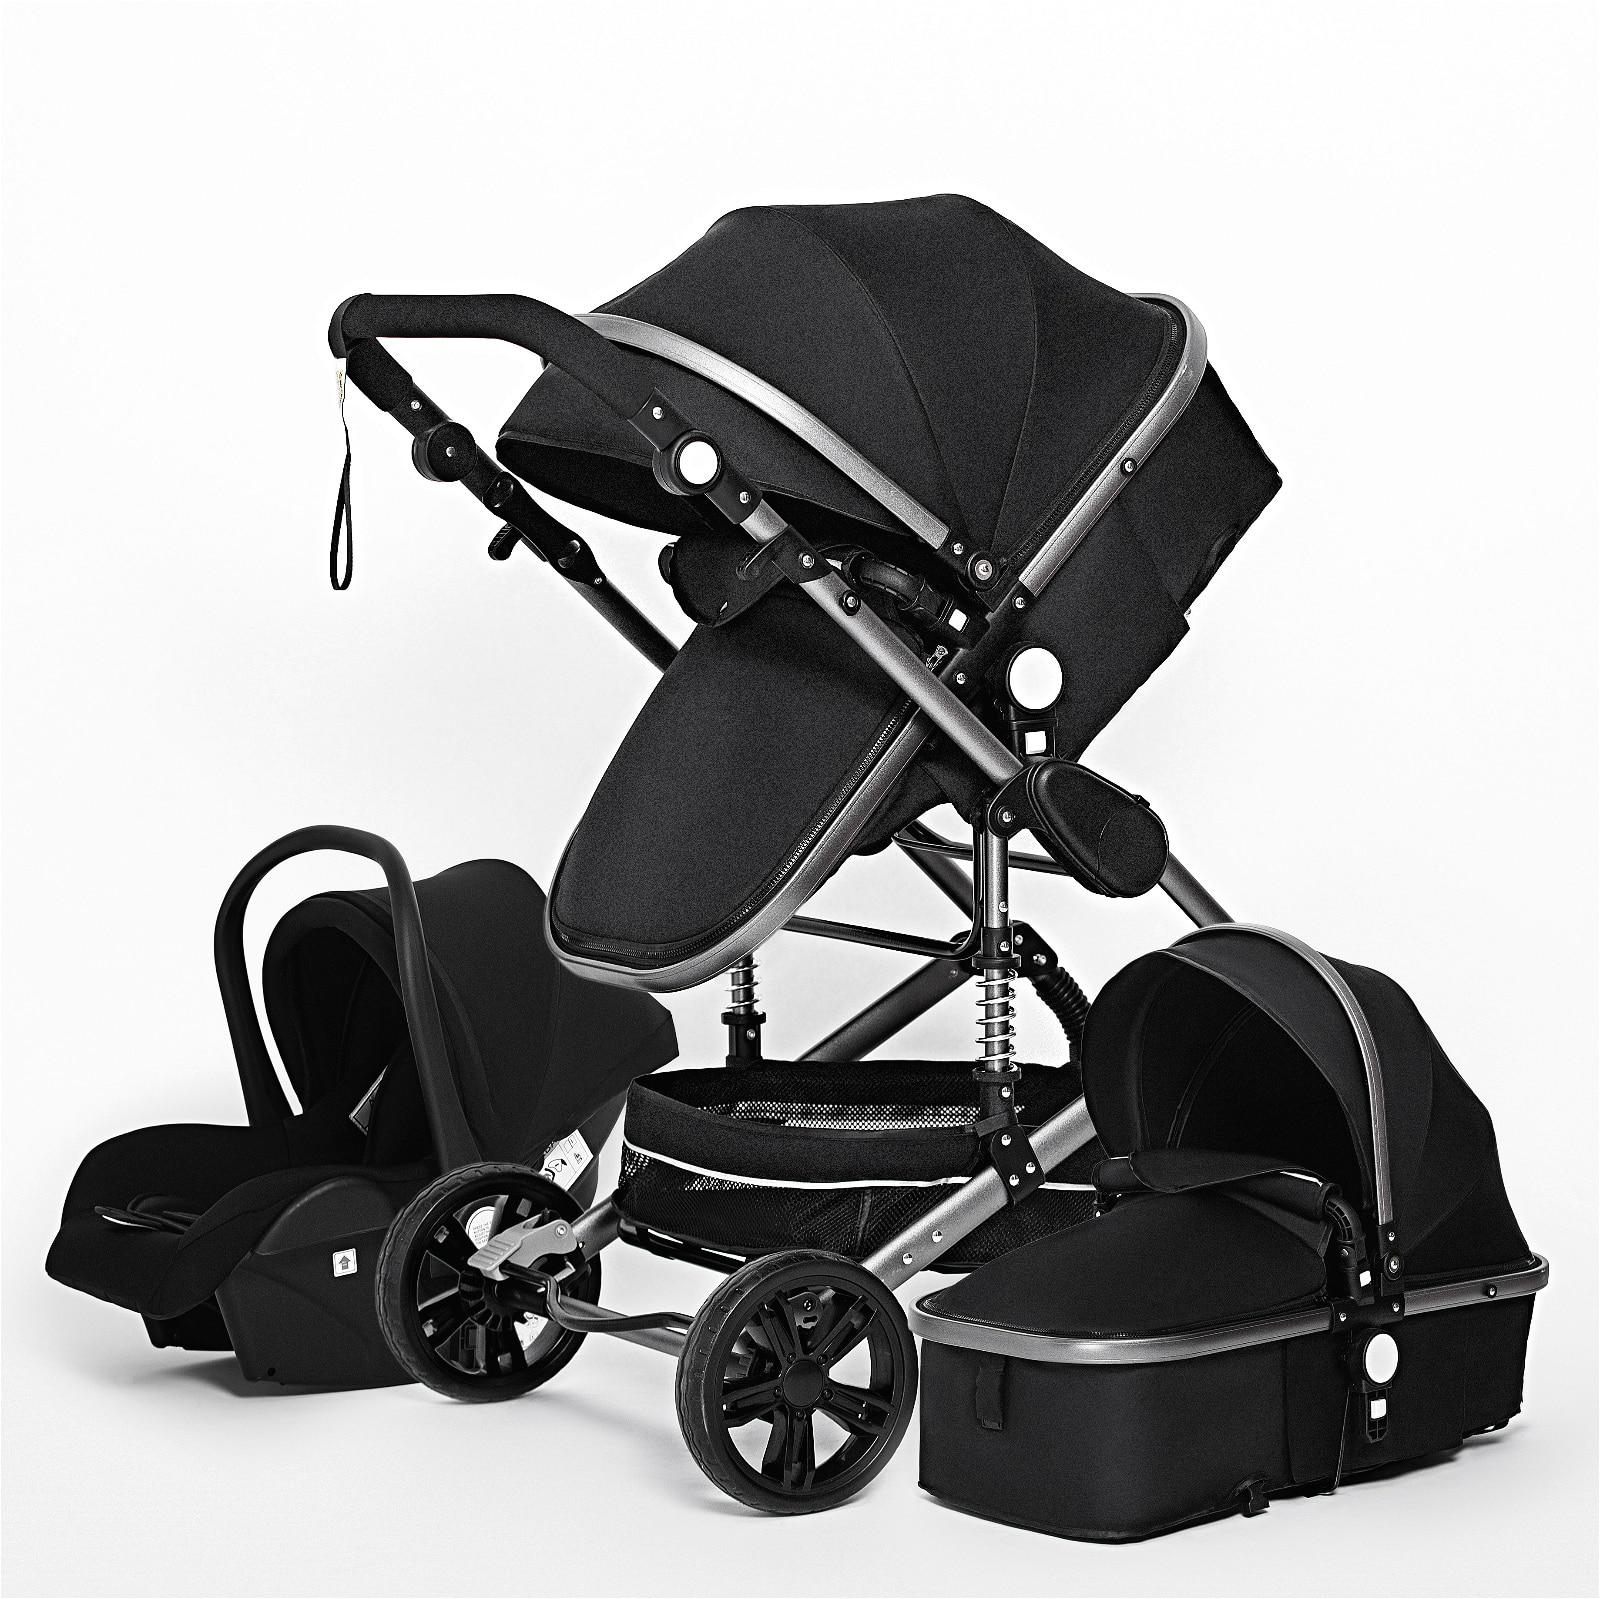 Baby Stroller 3 in 1 Luxurious Portable Travel Baby Carriage Folding Prams Aluminum Frame High Landscape Stroller Newborn Cart enlarge